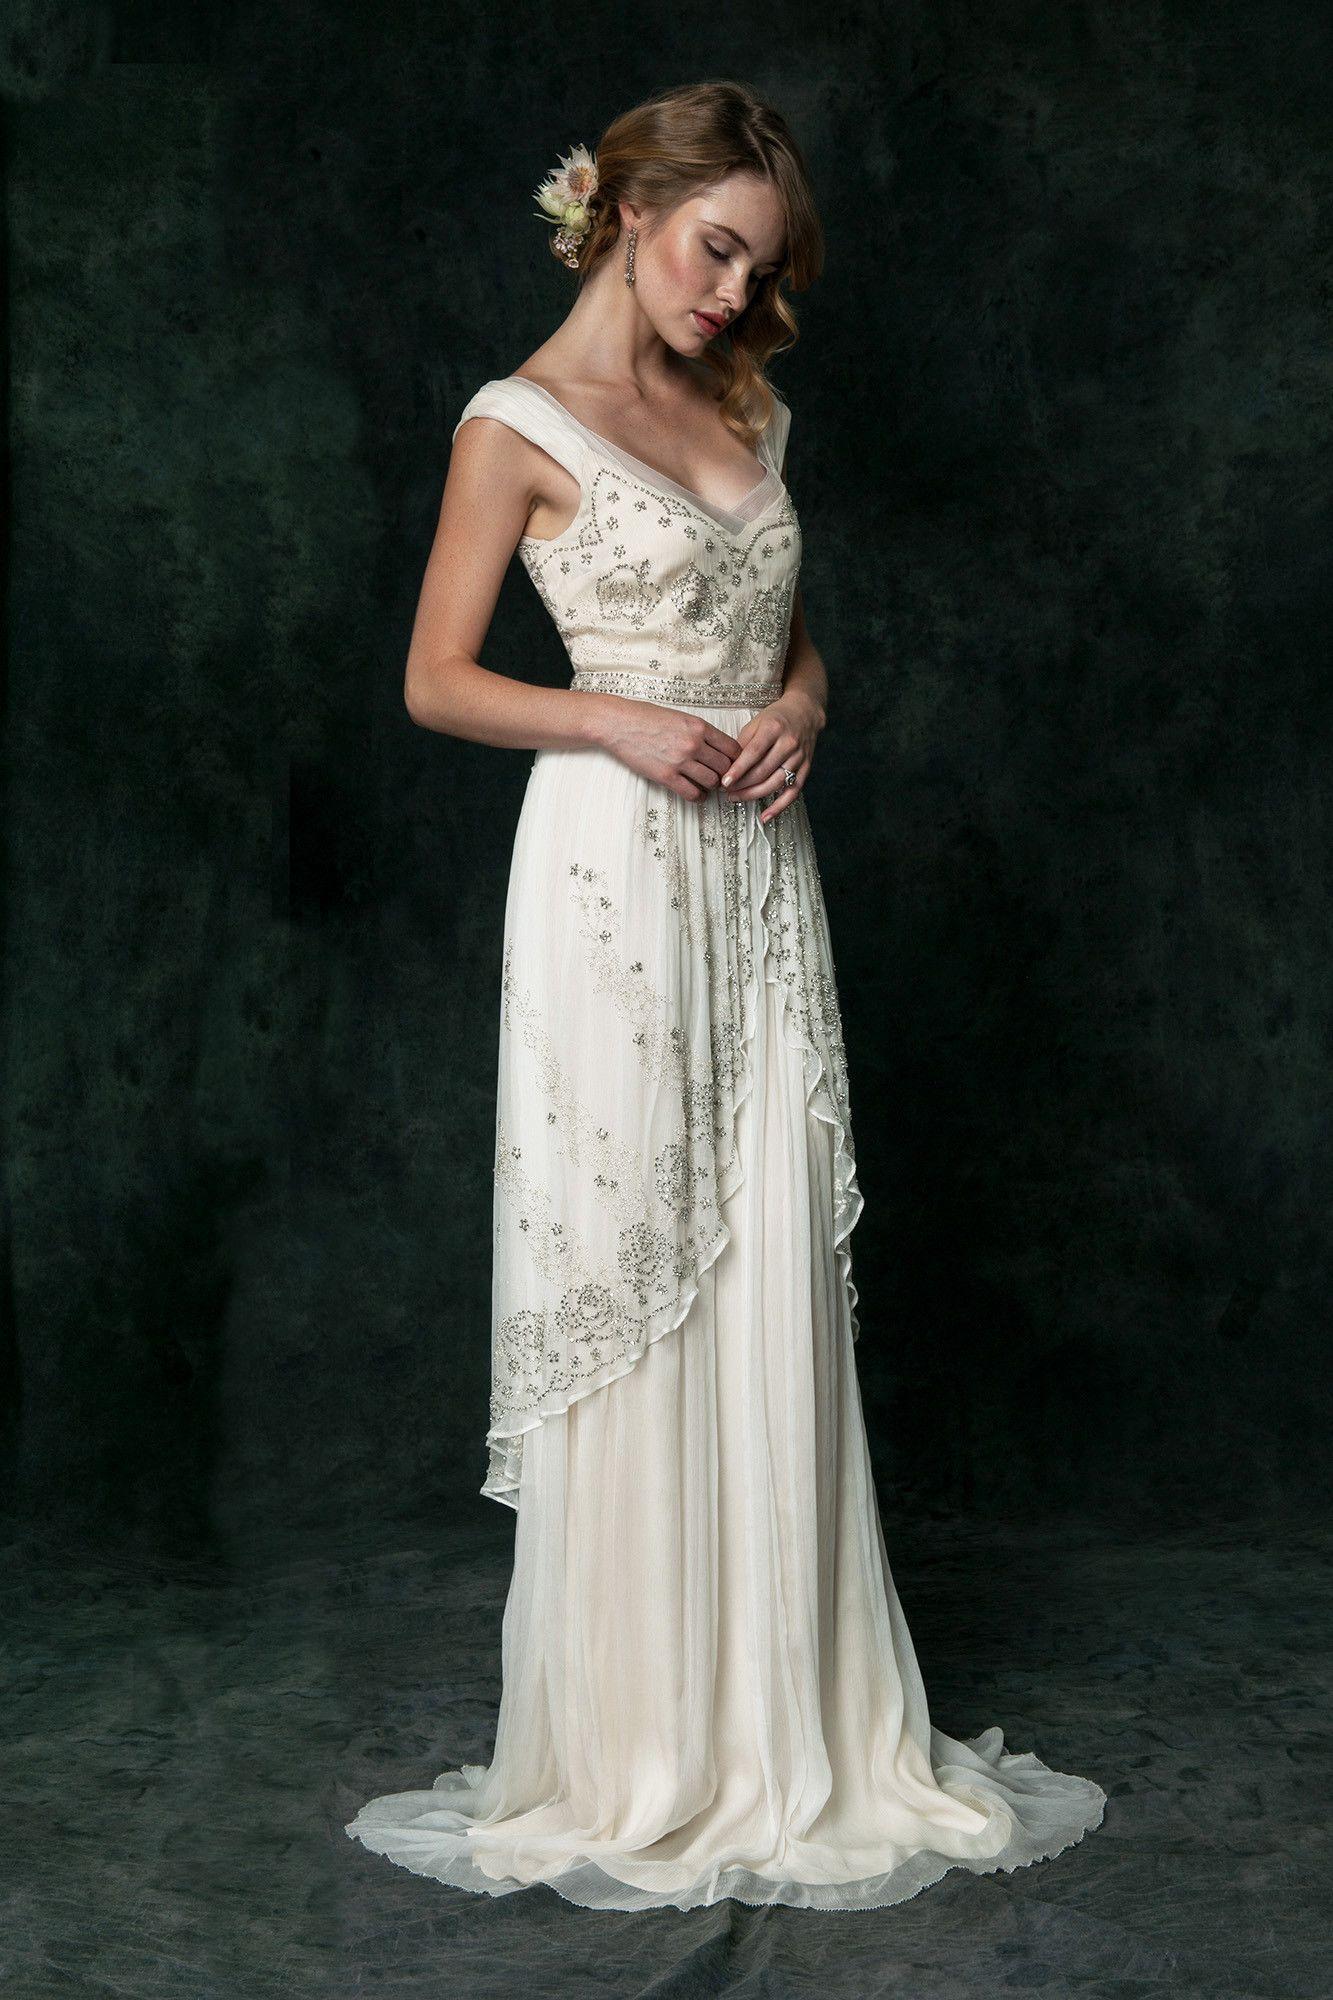 Tea length sleeve wedding dress  Qk  Discover more ideas about Tea length